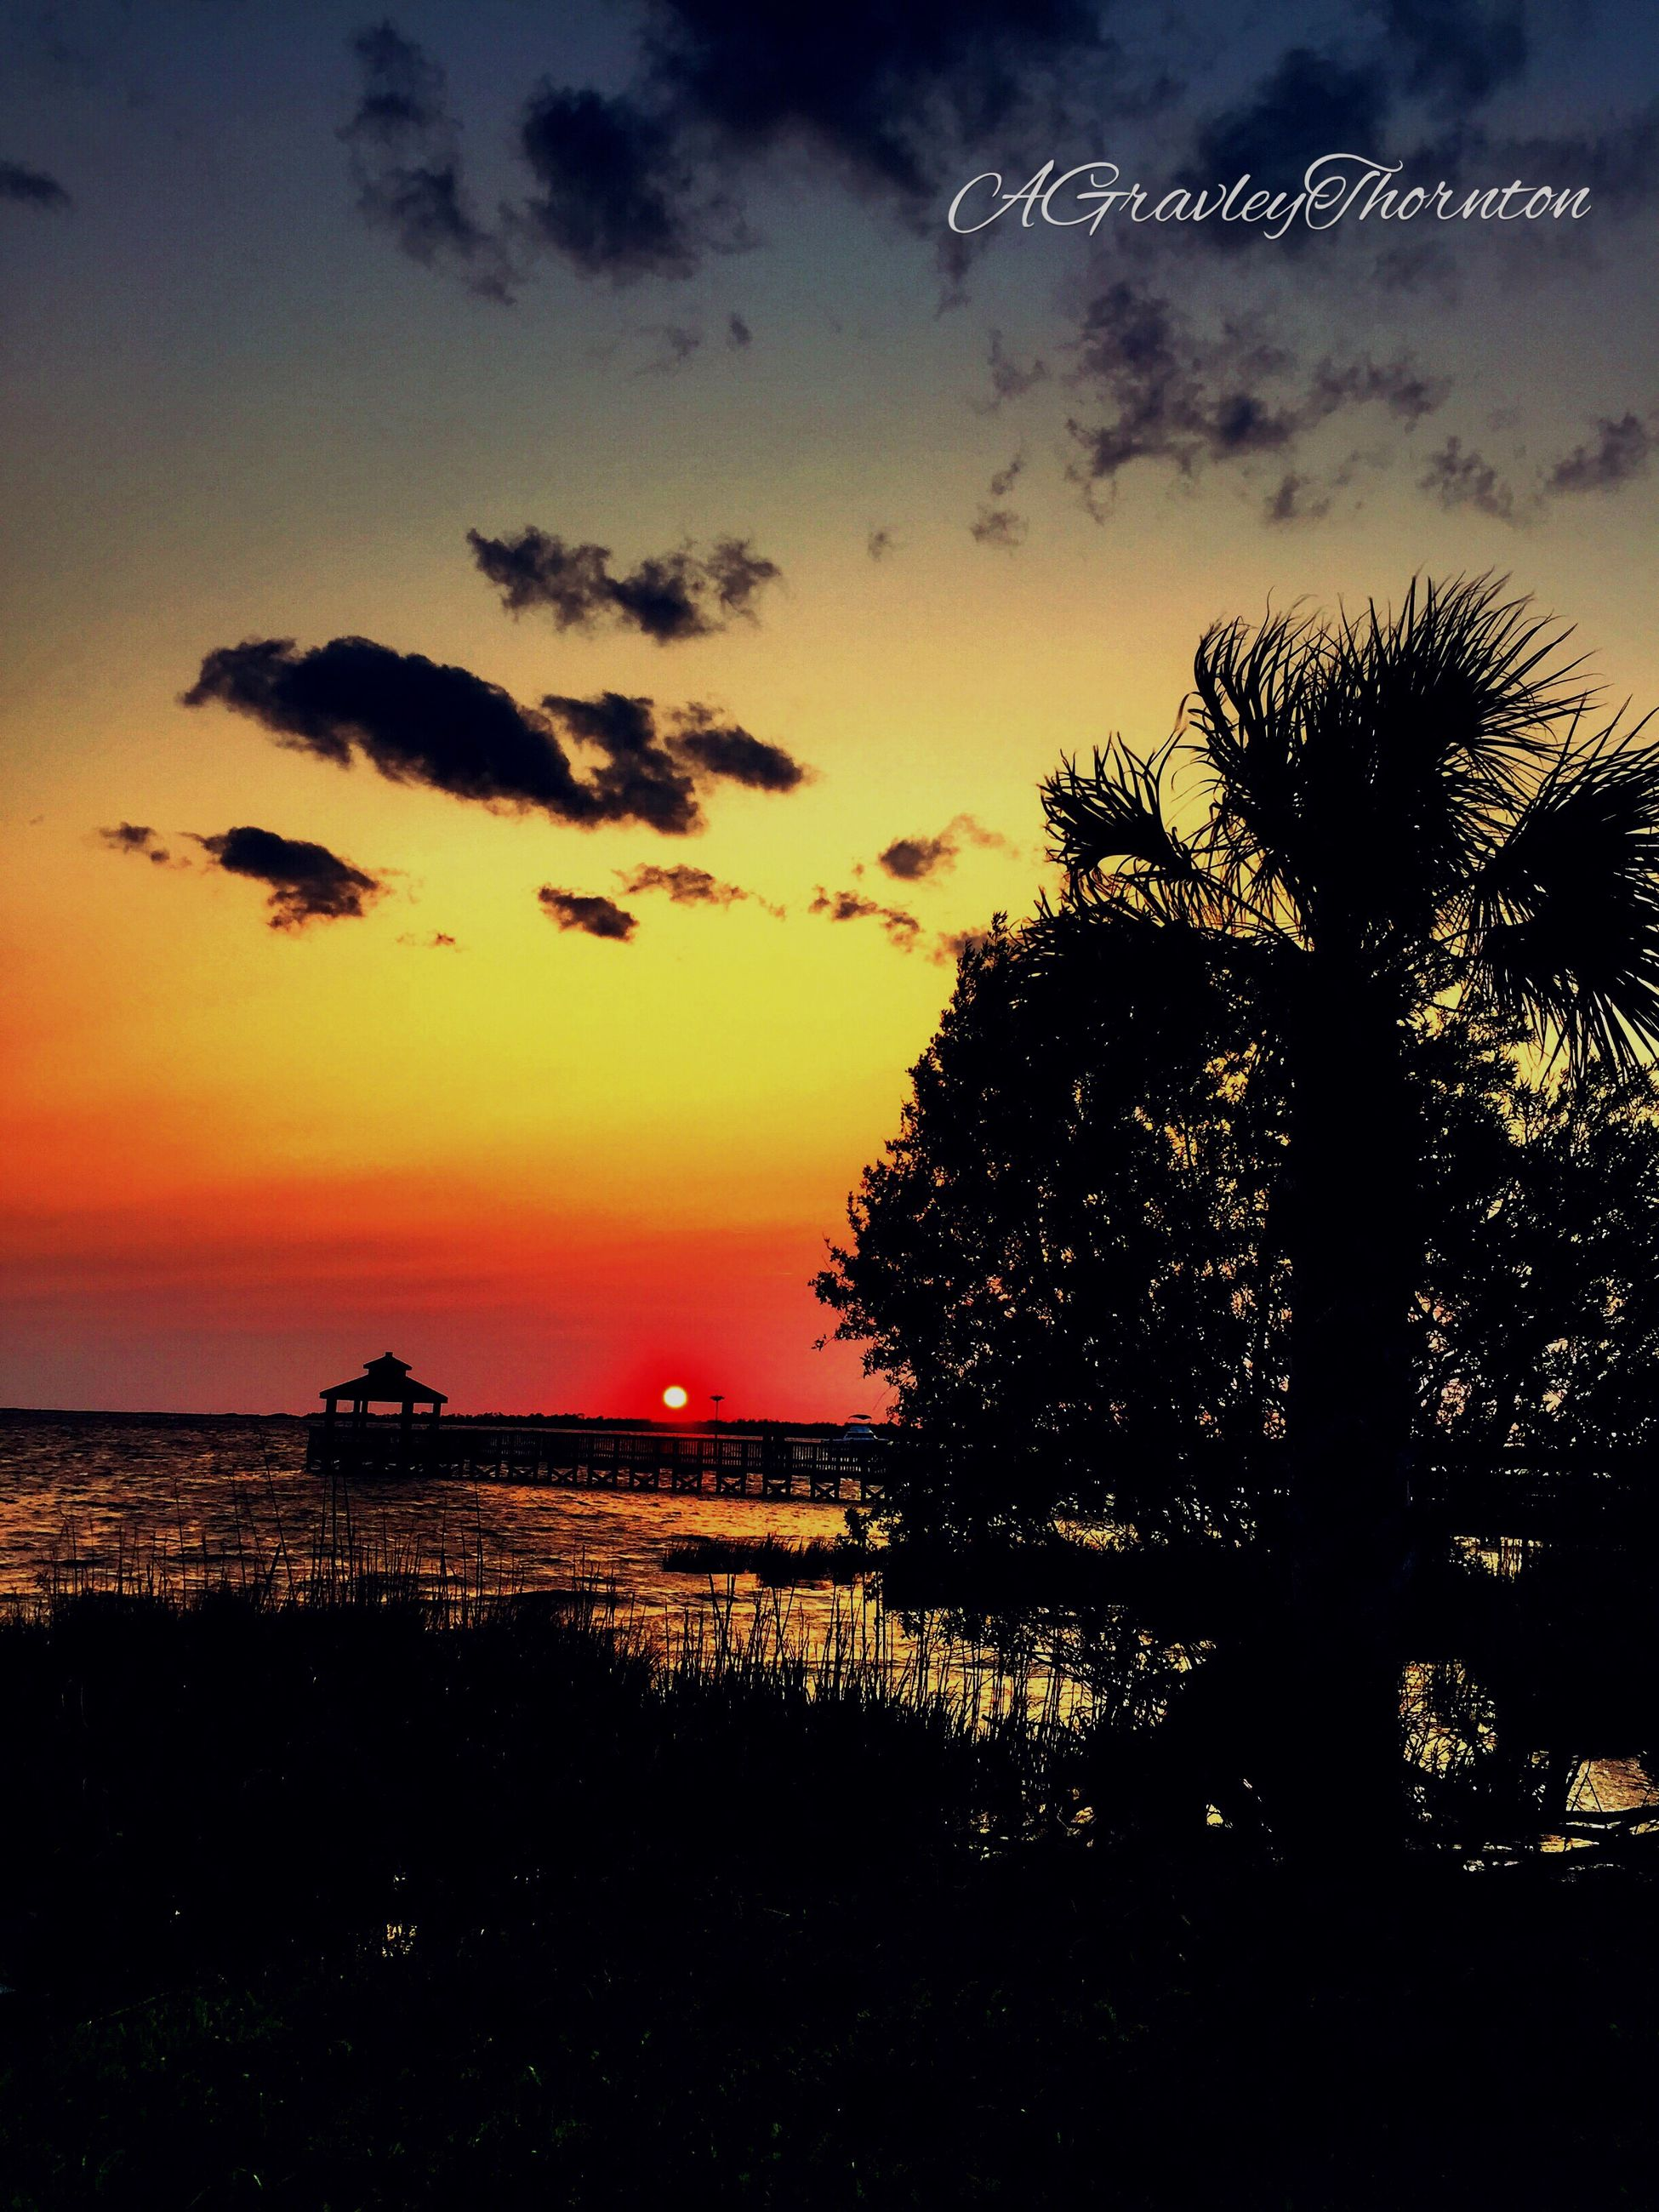 sunset, silhouette, scenics, sky, sea, tranquil scene, tranquility, beauty in nature, horizon over water, water, orange color, nature, idyllic, tree, cloud - sky, beach, sun, dramatic sky, dusk, cloud